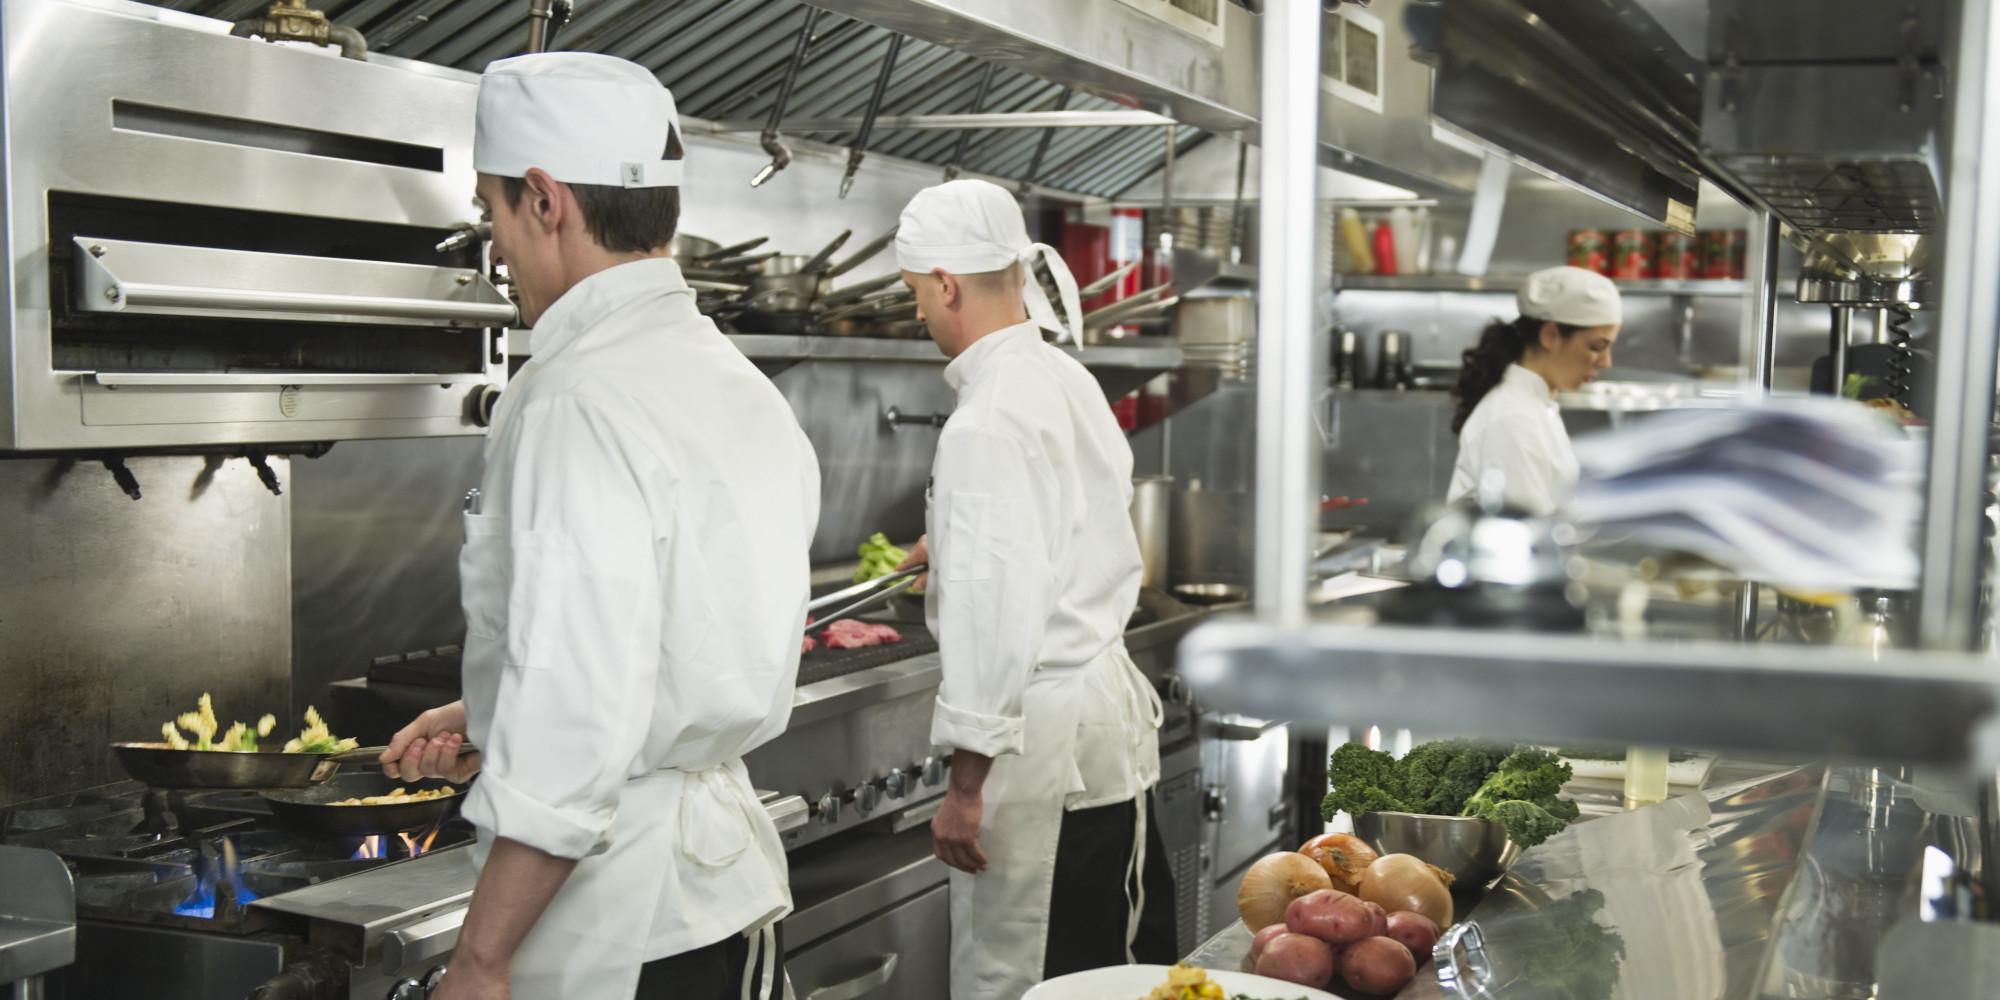 kitchen chief cart with butcher block top chef shortage in restaurant kitchens service first